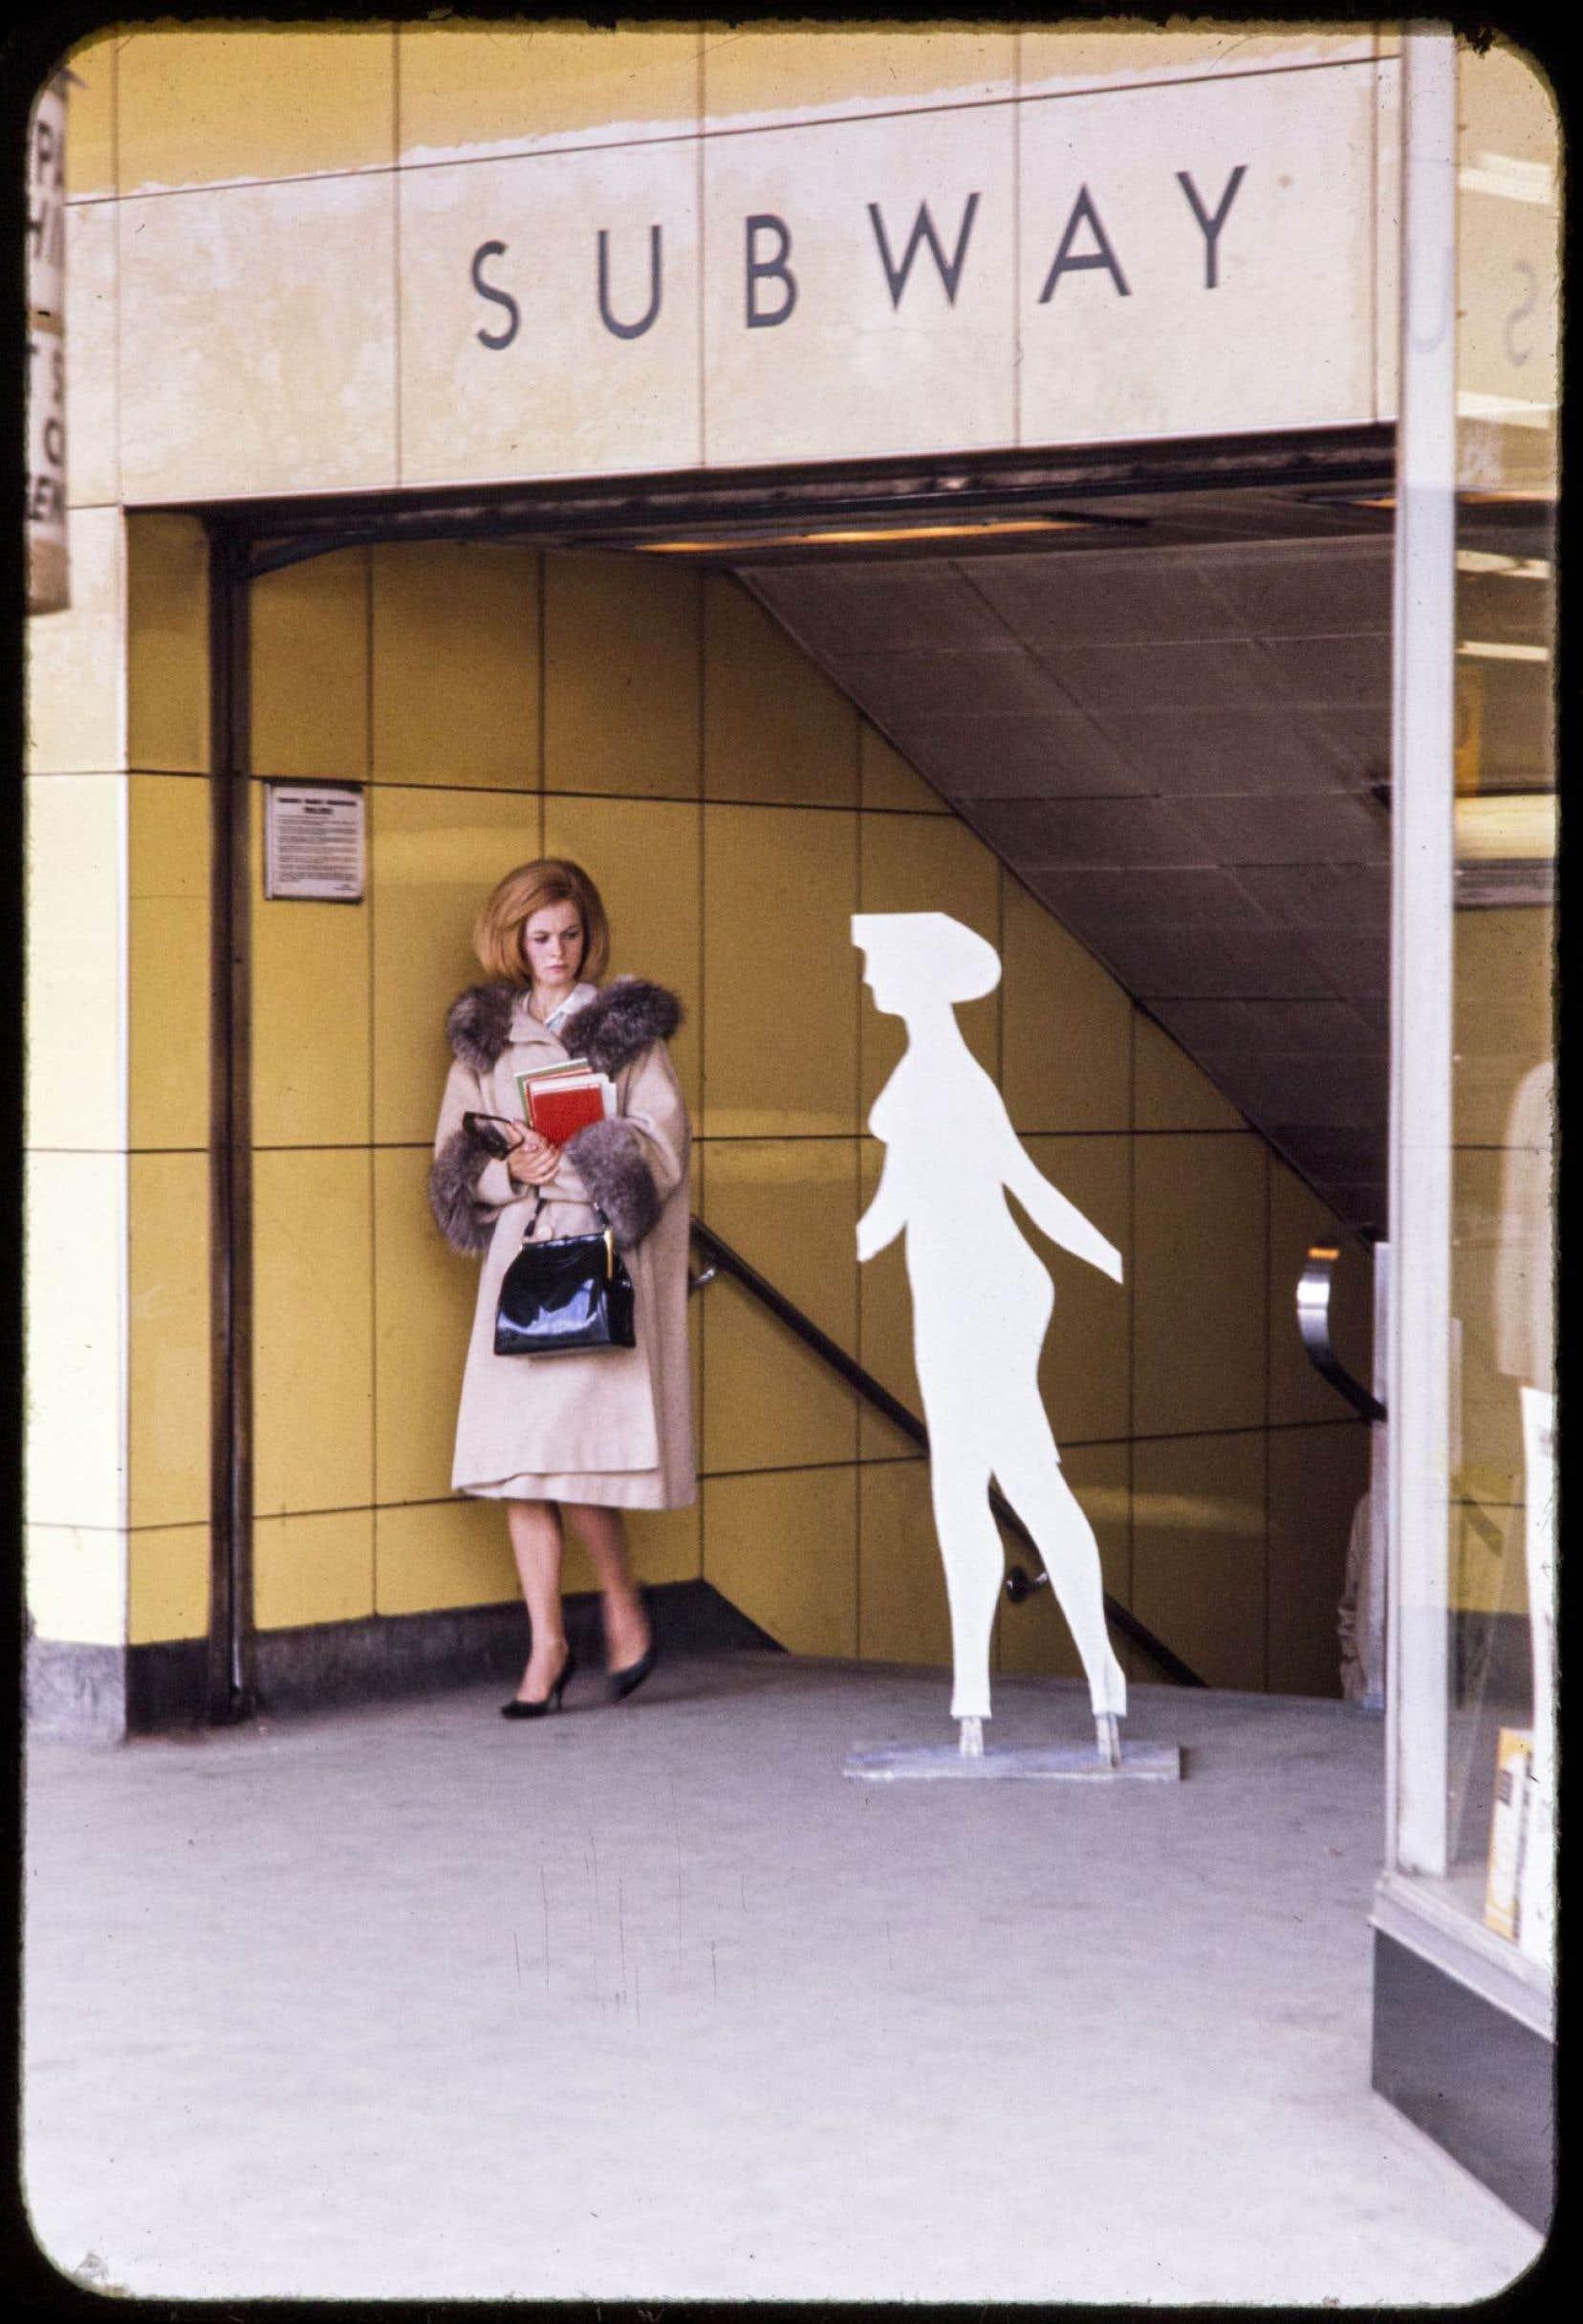 Michael Snow, Walking Woman in Toronto Subway, 1963-2016